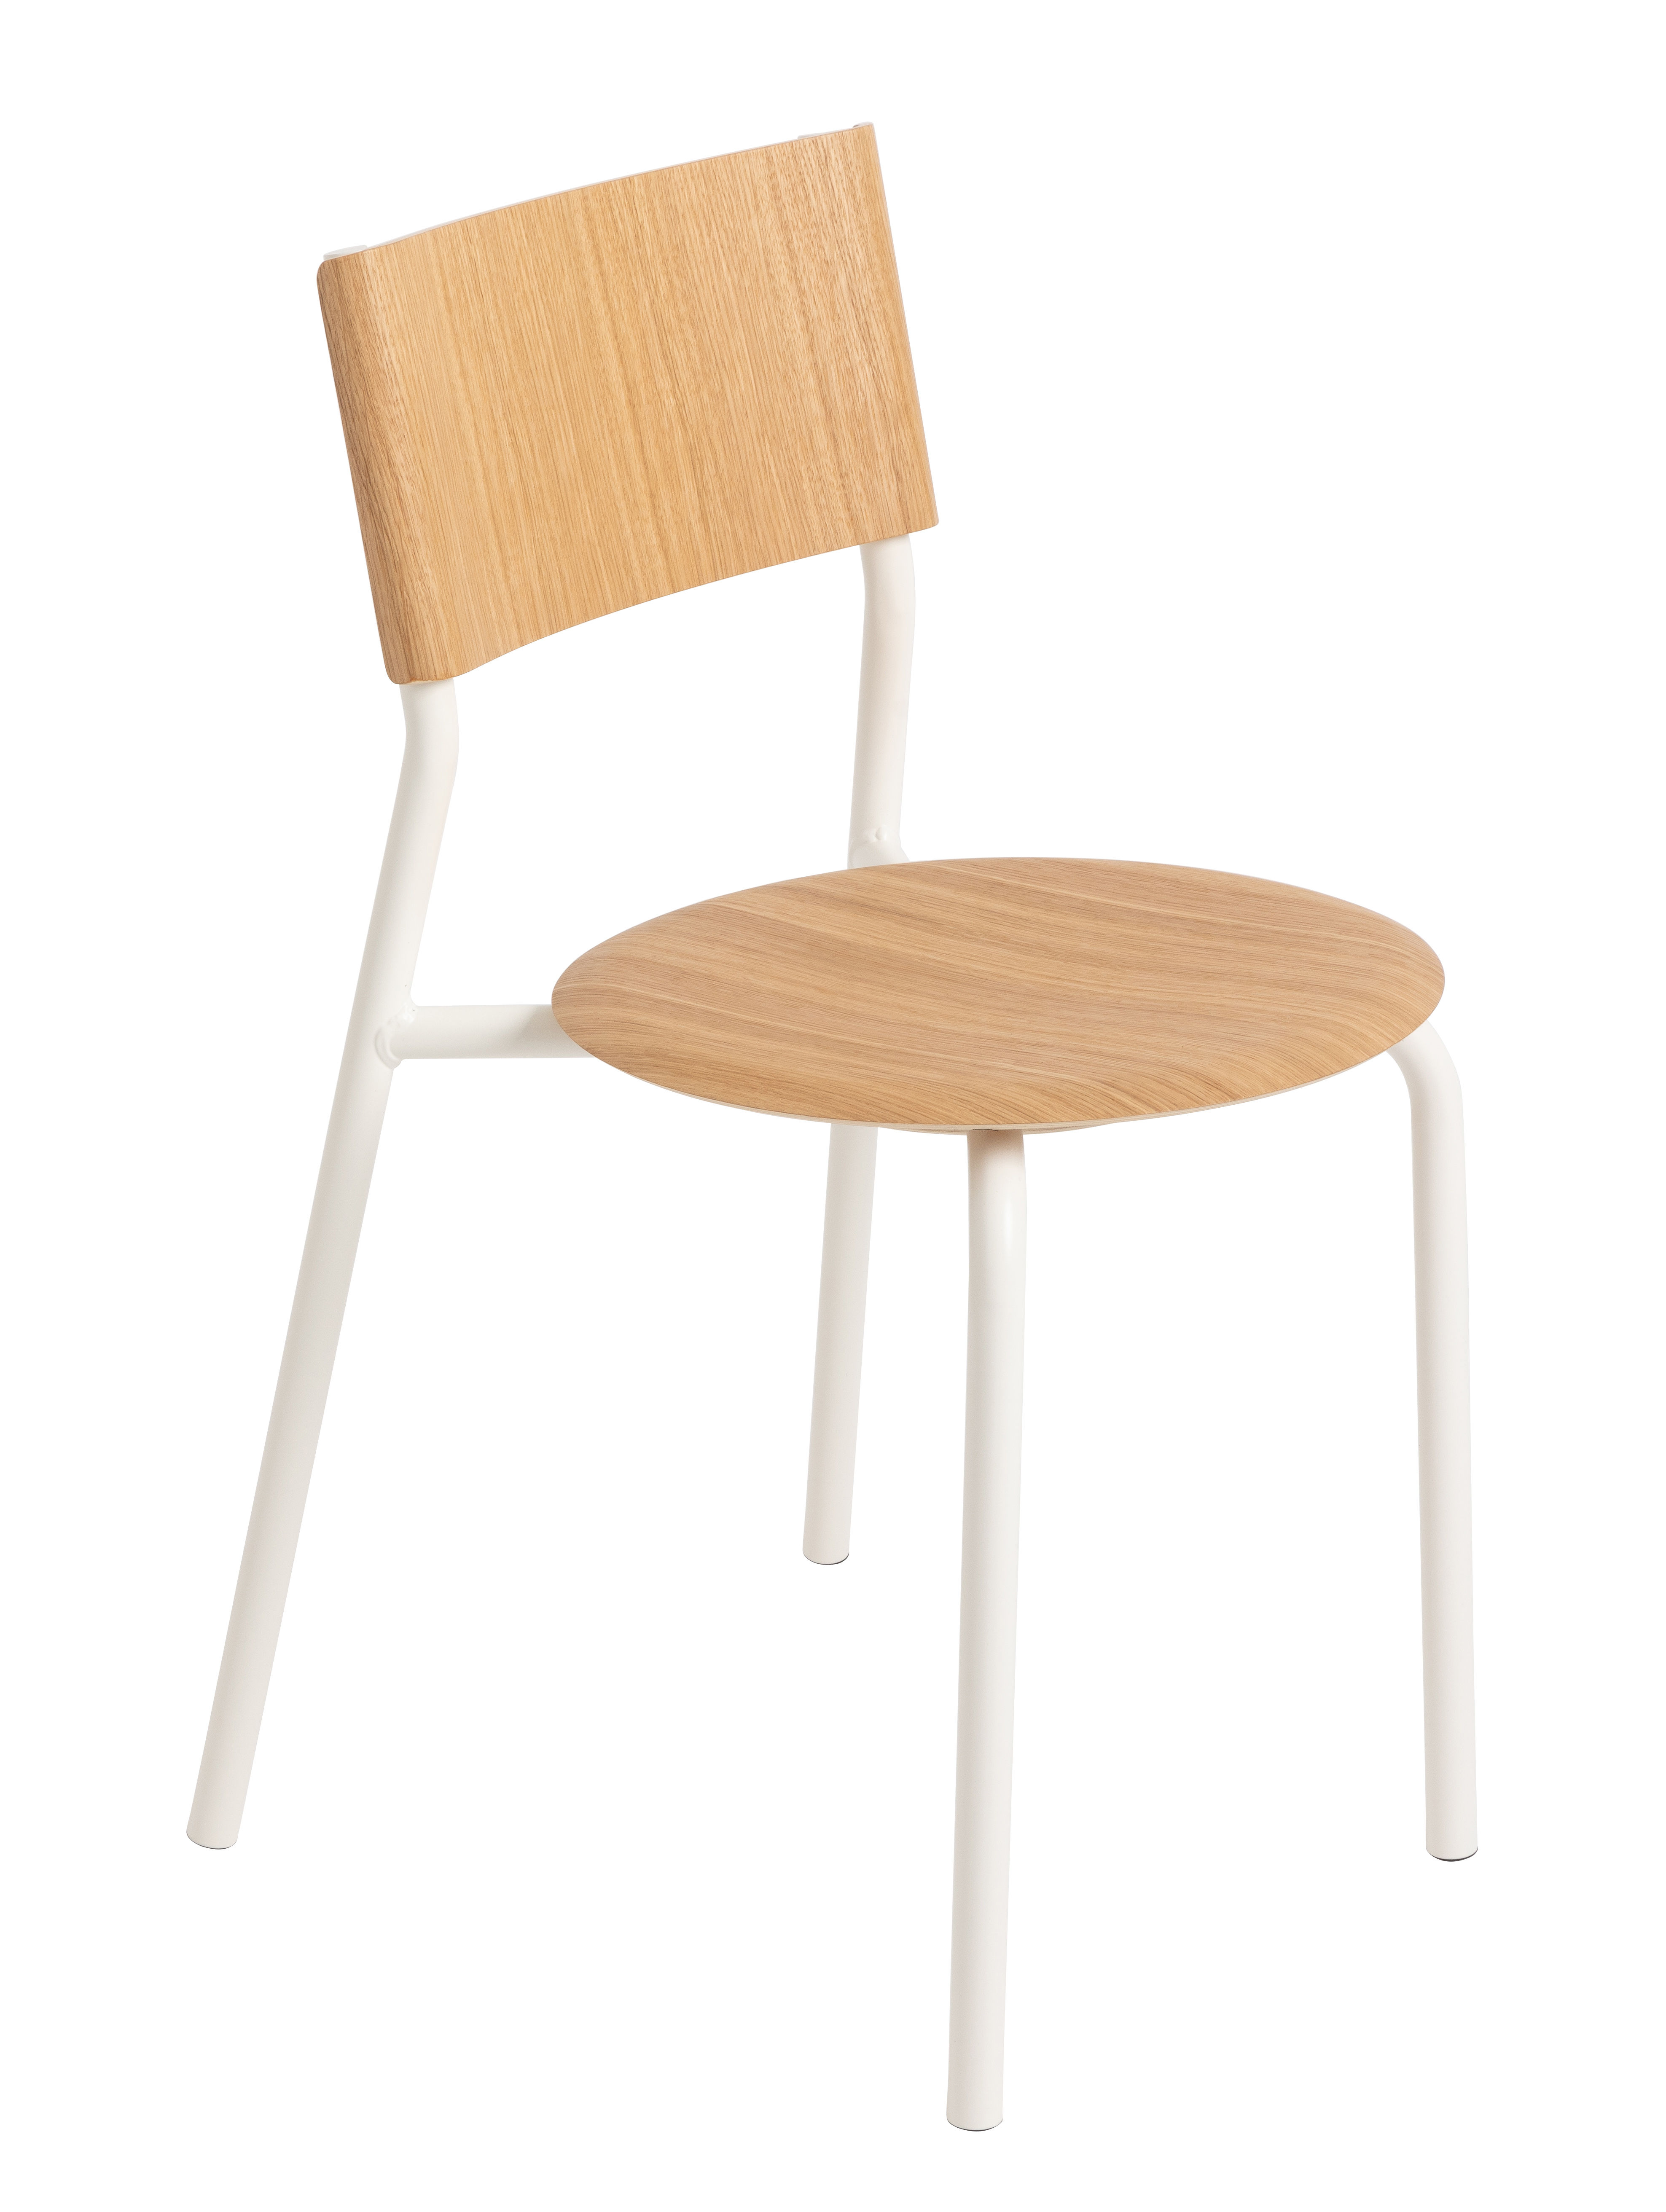 Furniture - Chairs - SSD Stacking chair - / Oak by TipToe - Oak / White cloud - Oak, Powder coated steel